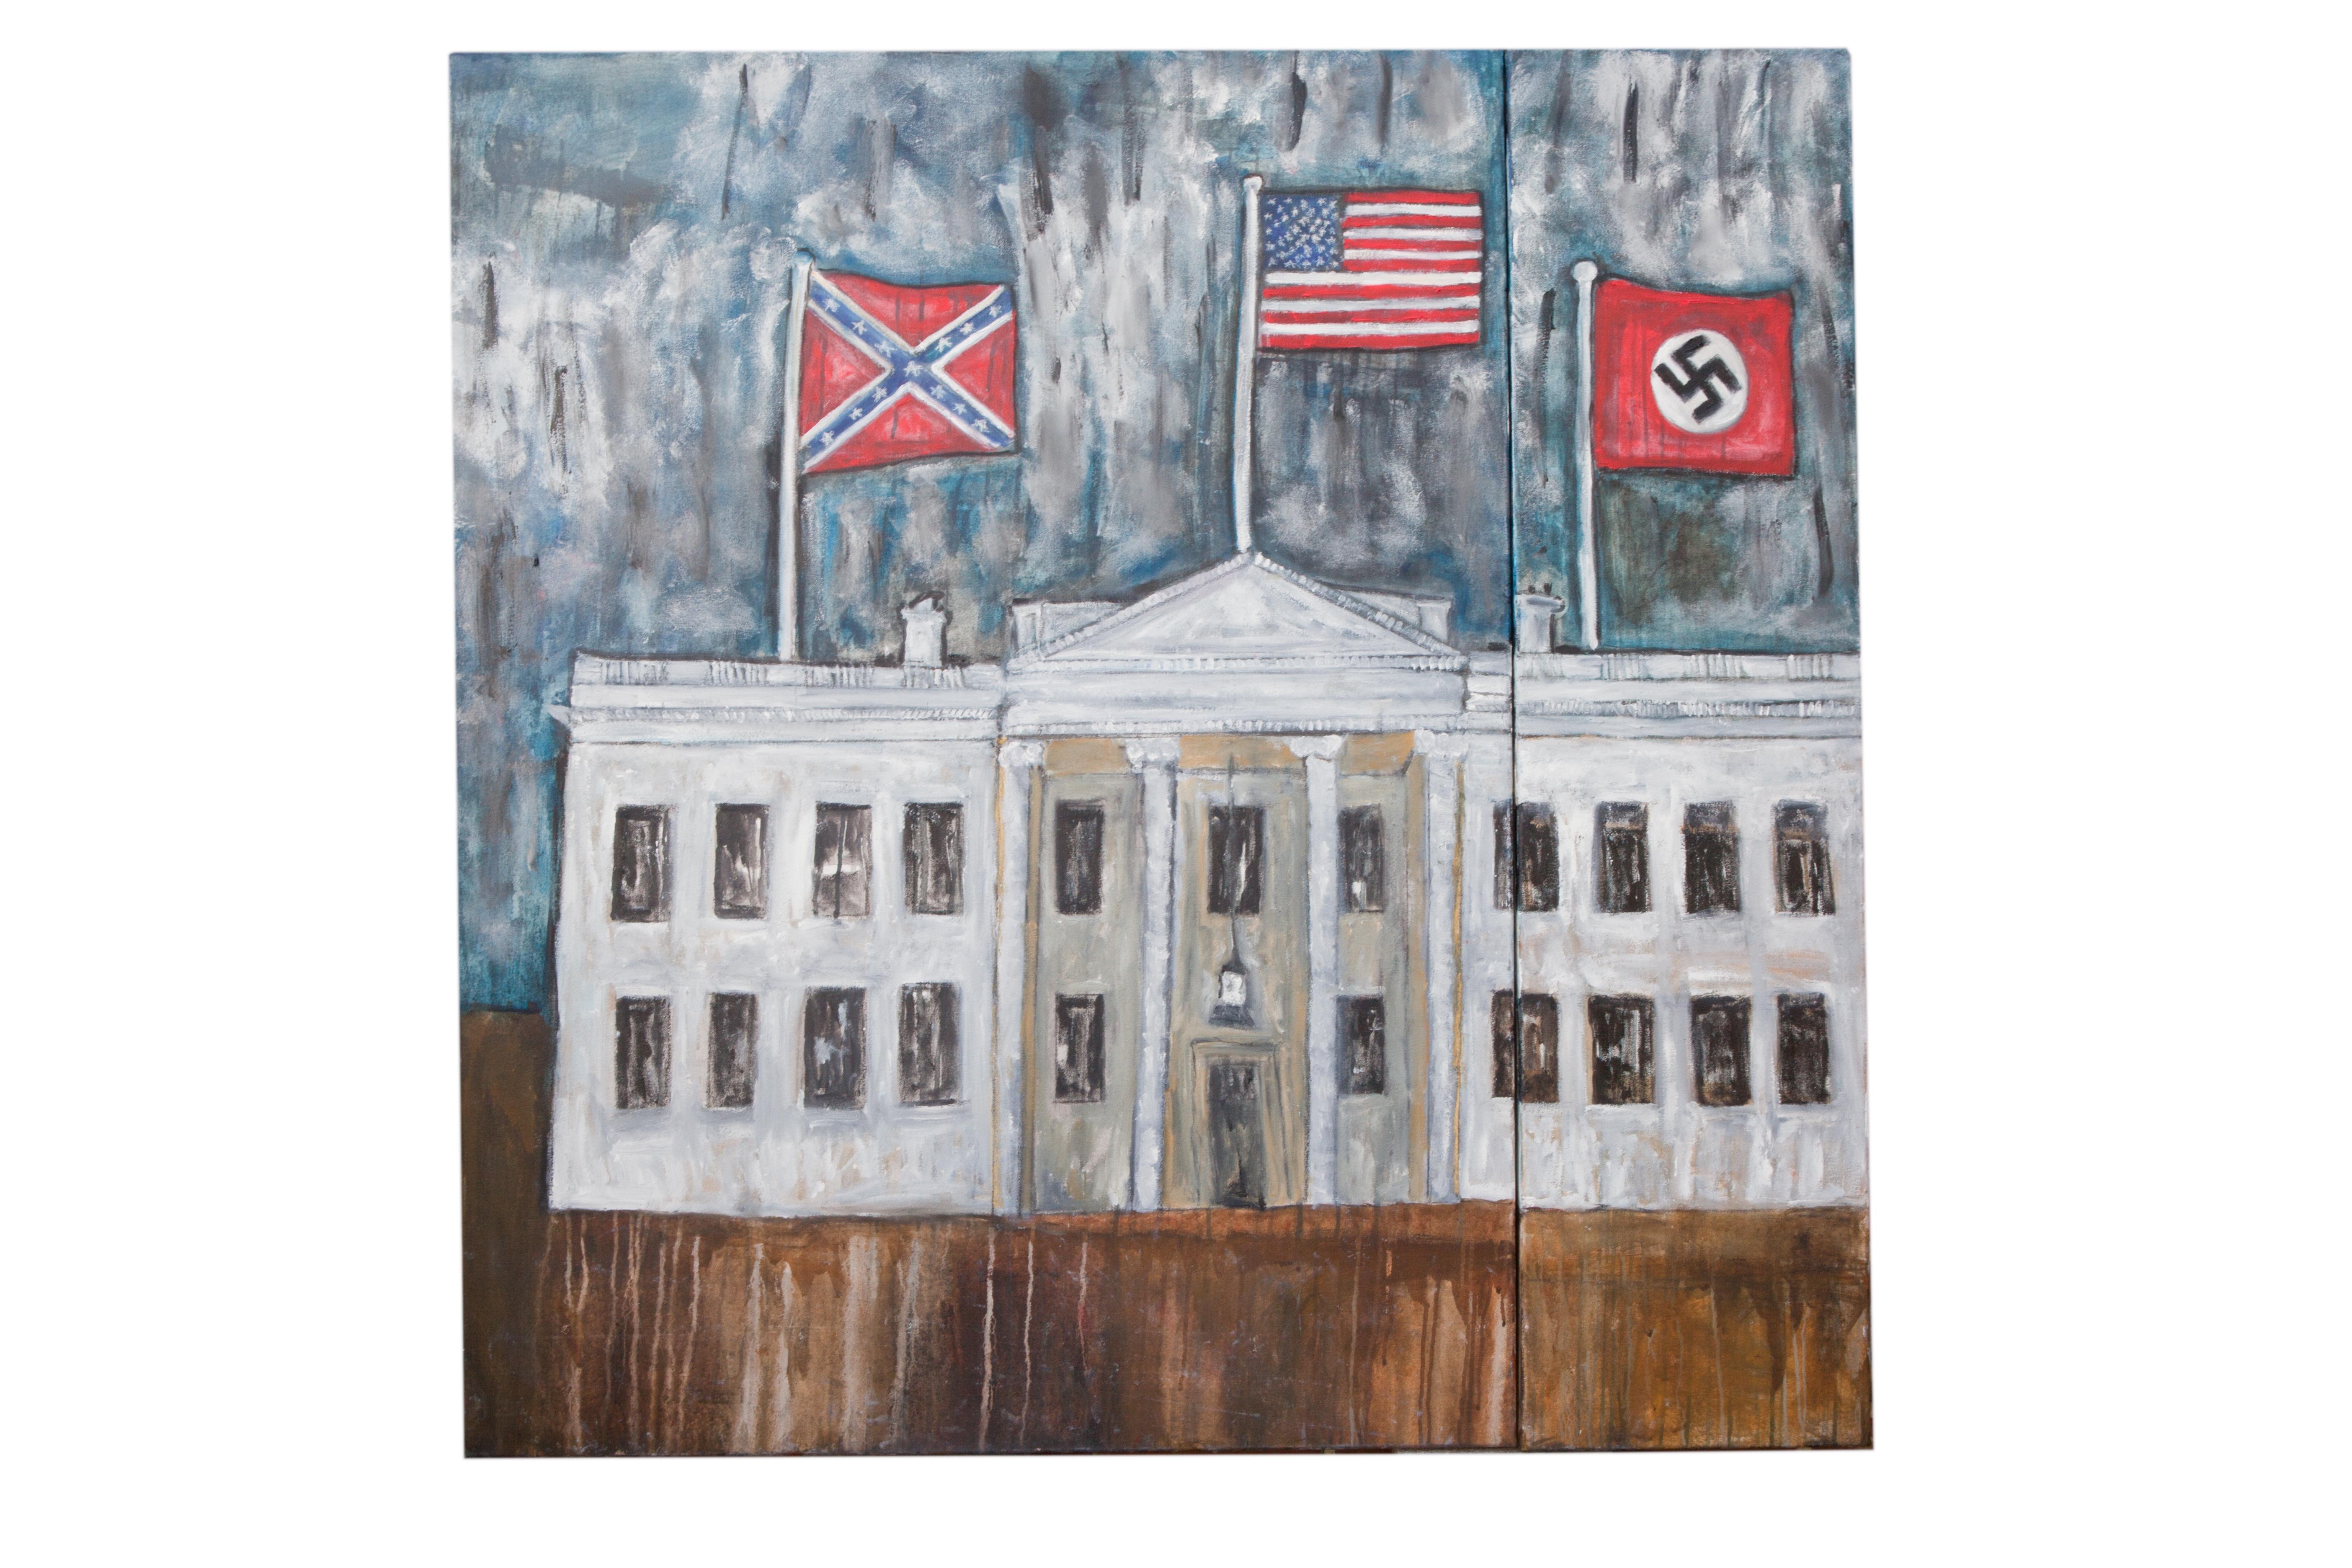 Constitution Censored One